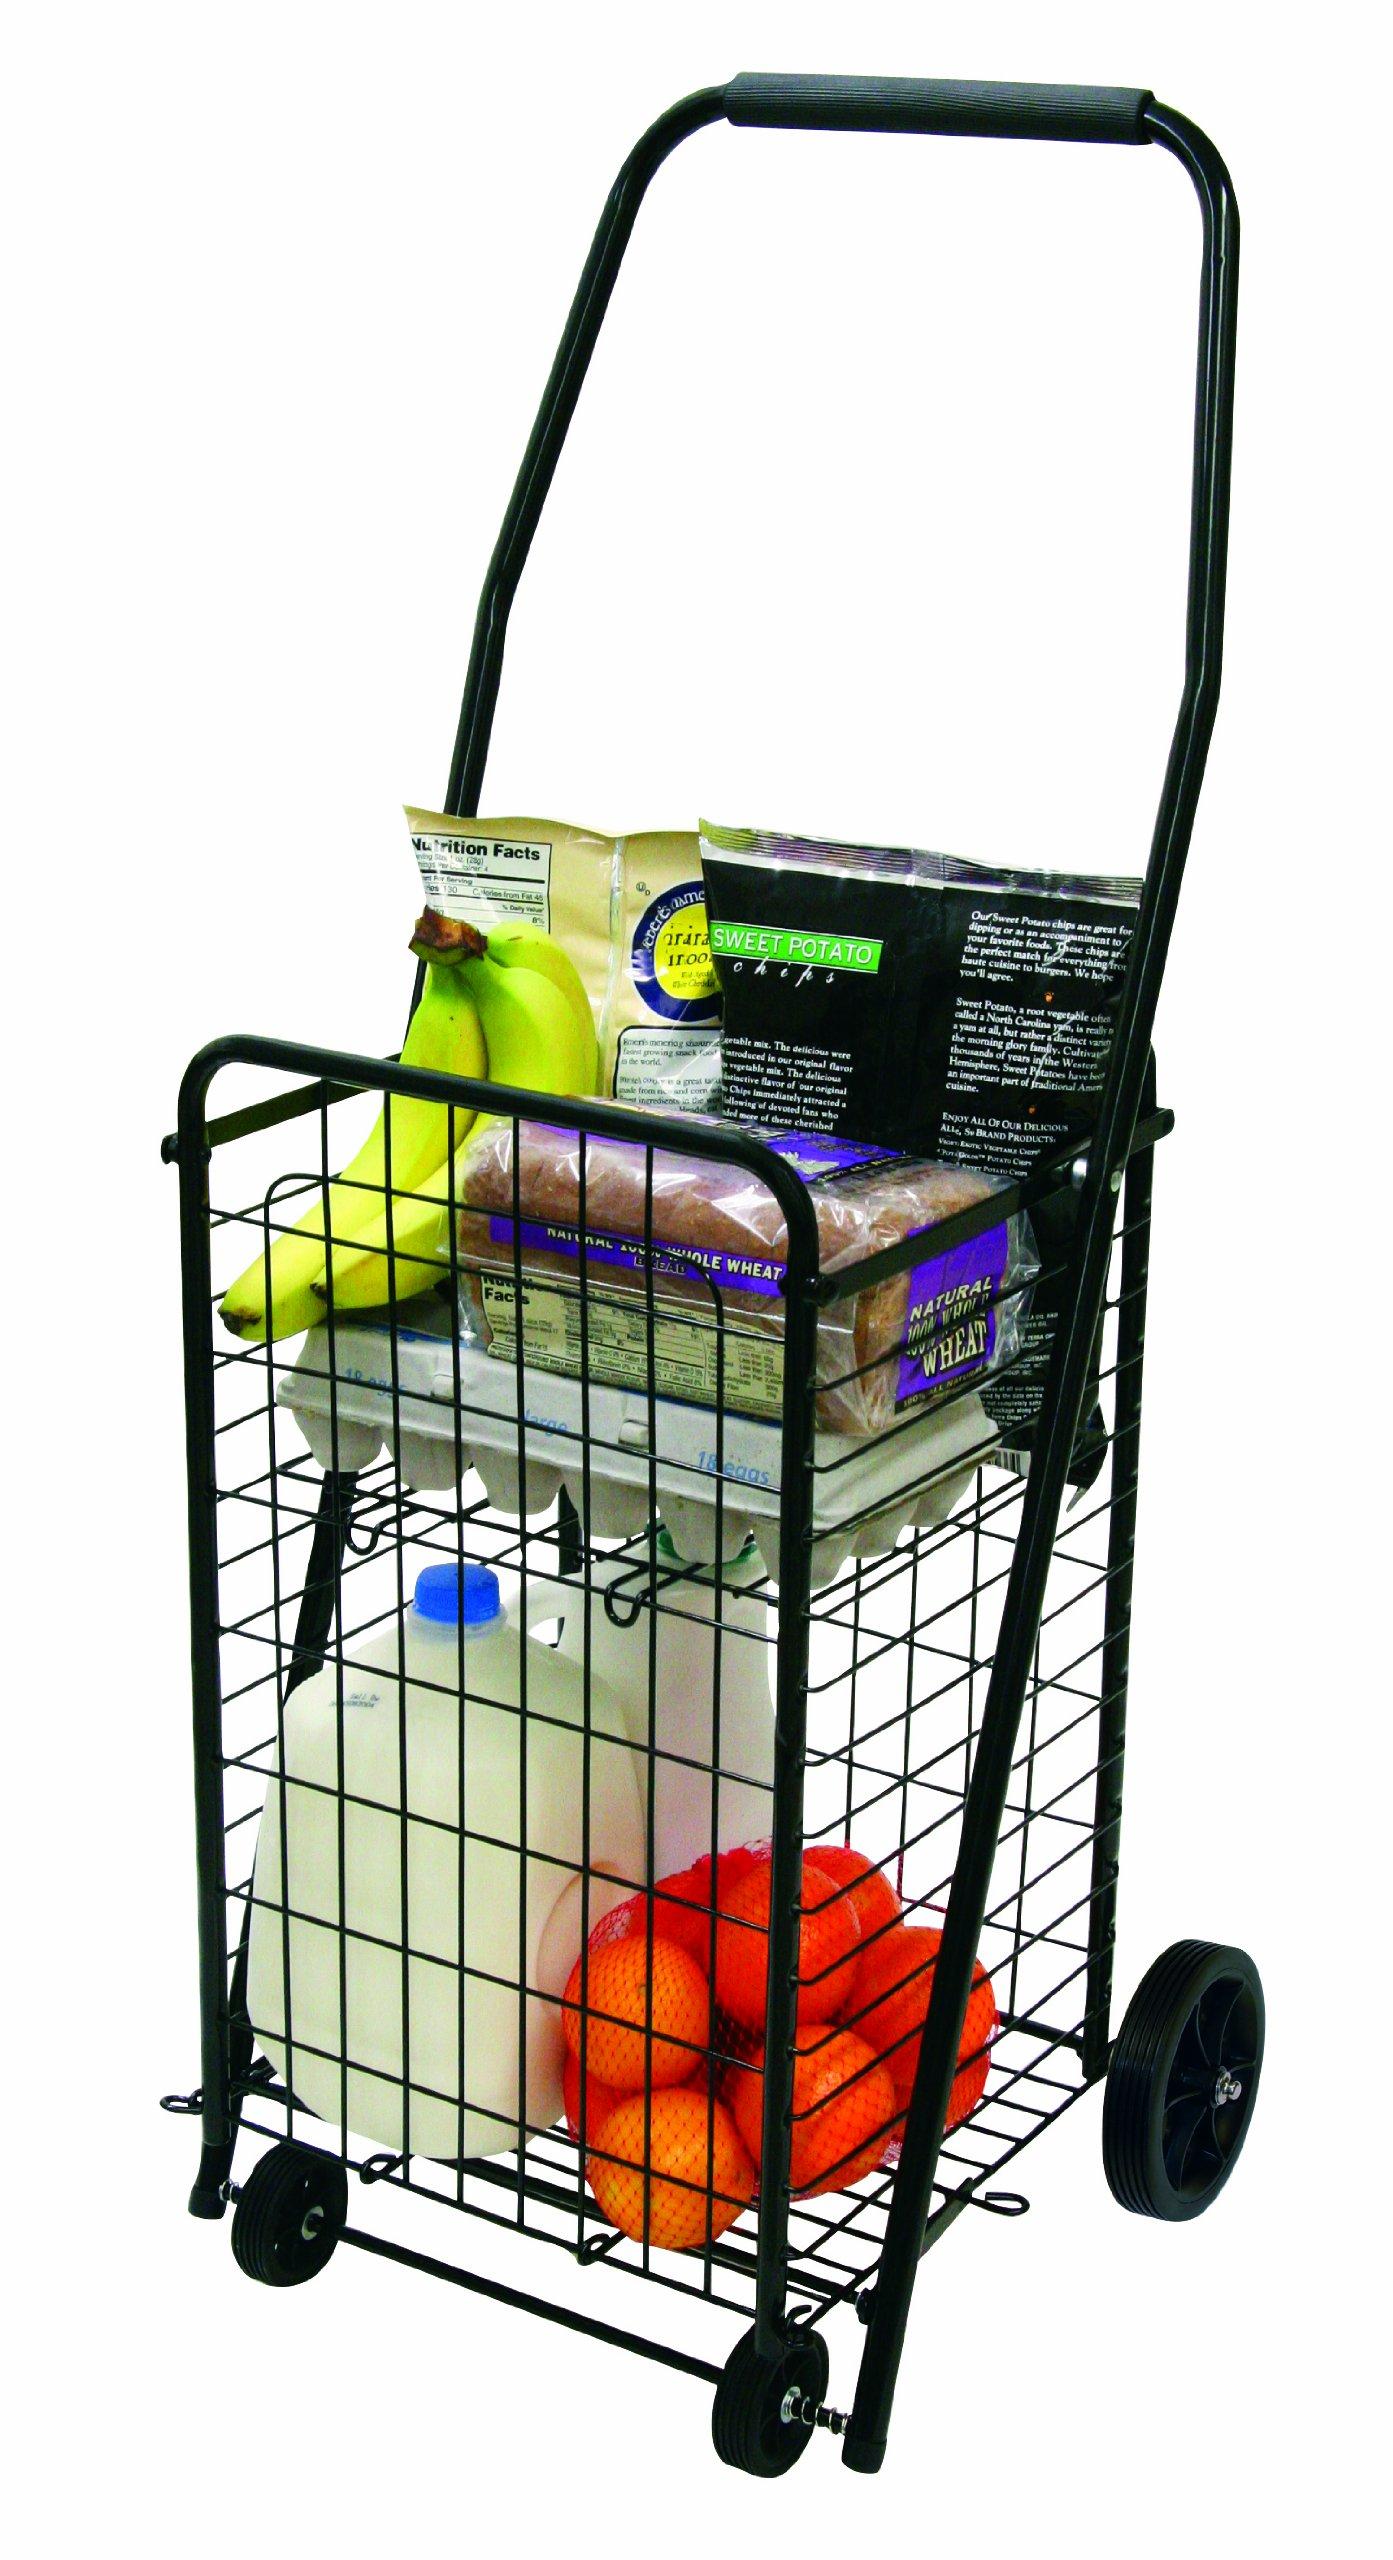 The Faucet Queens 16713 Pop 'n Shop Cart with Shelf, Black